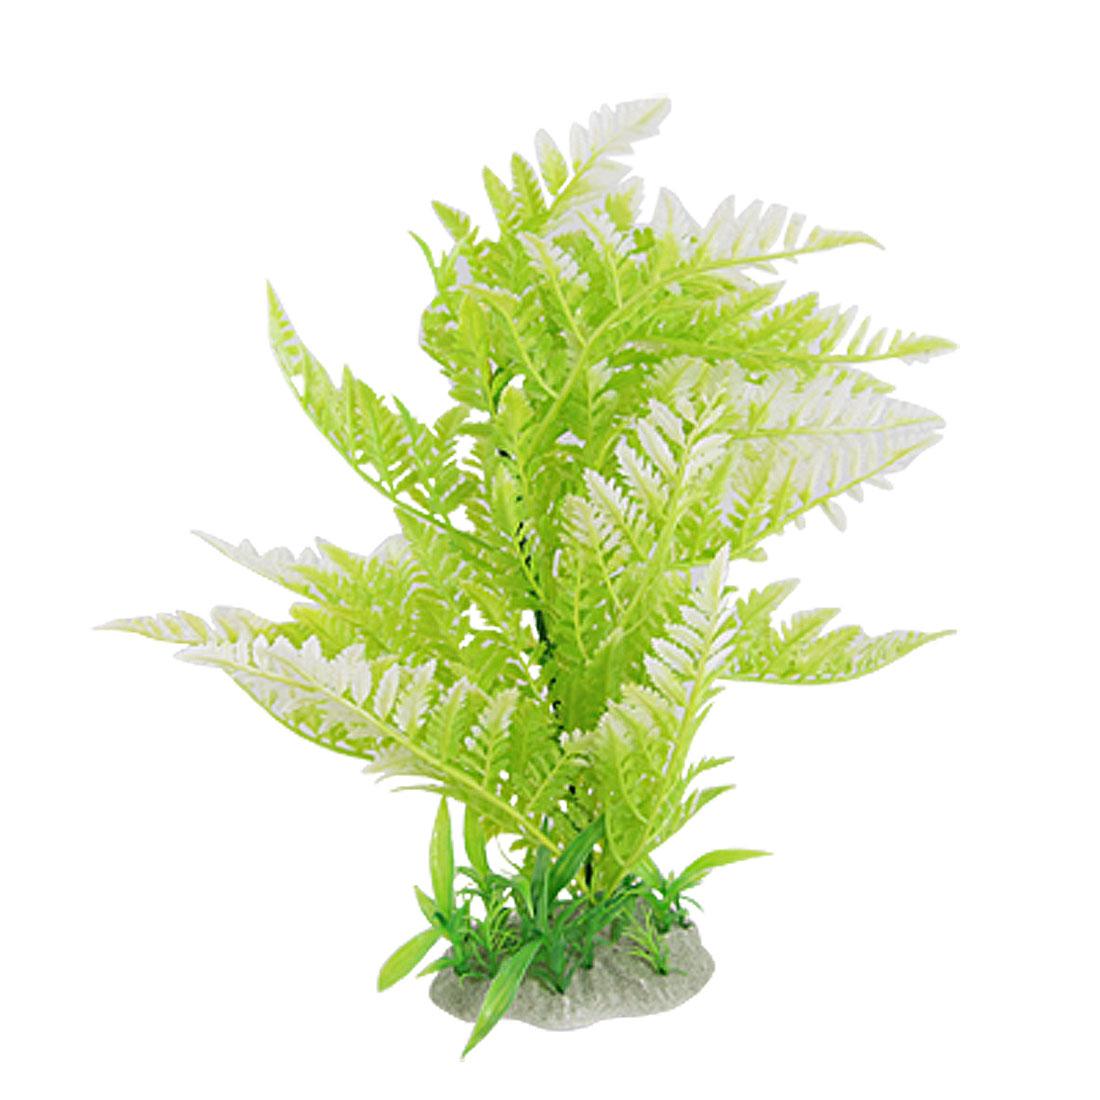 Green Standing Plastic Plant Ornament Water Wonder for Aquarium